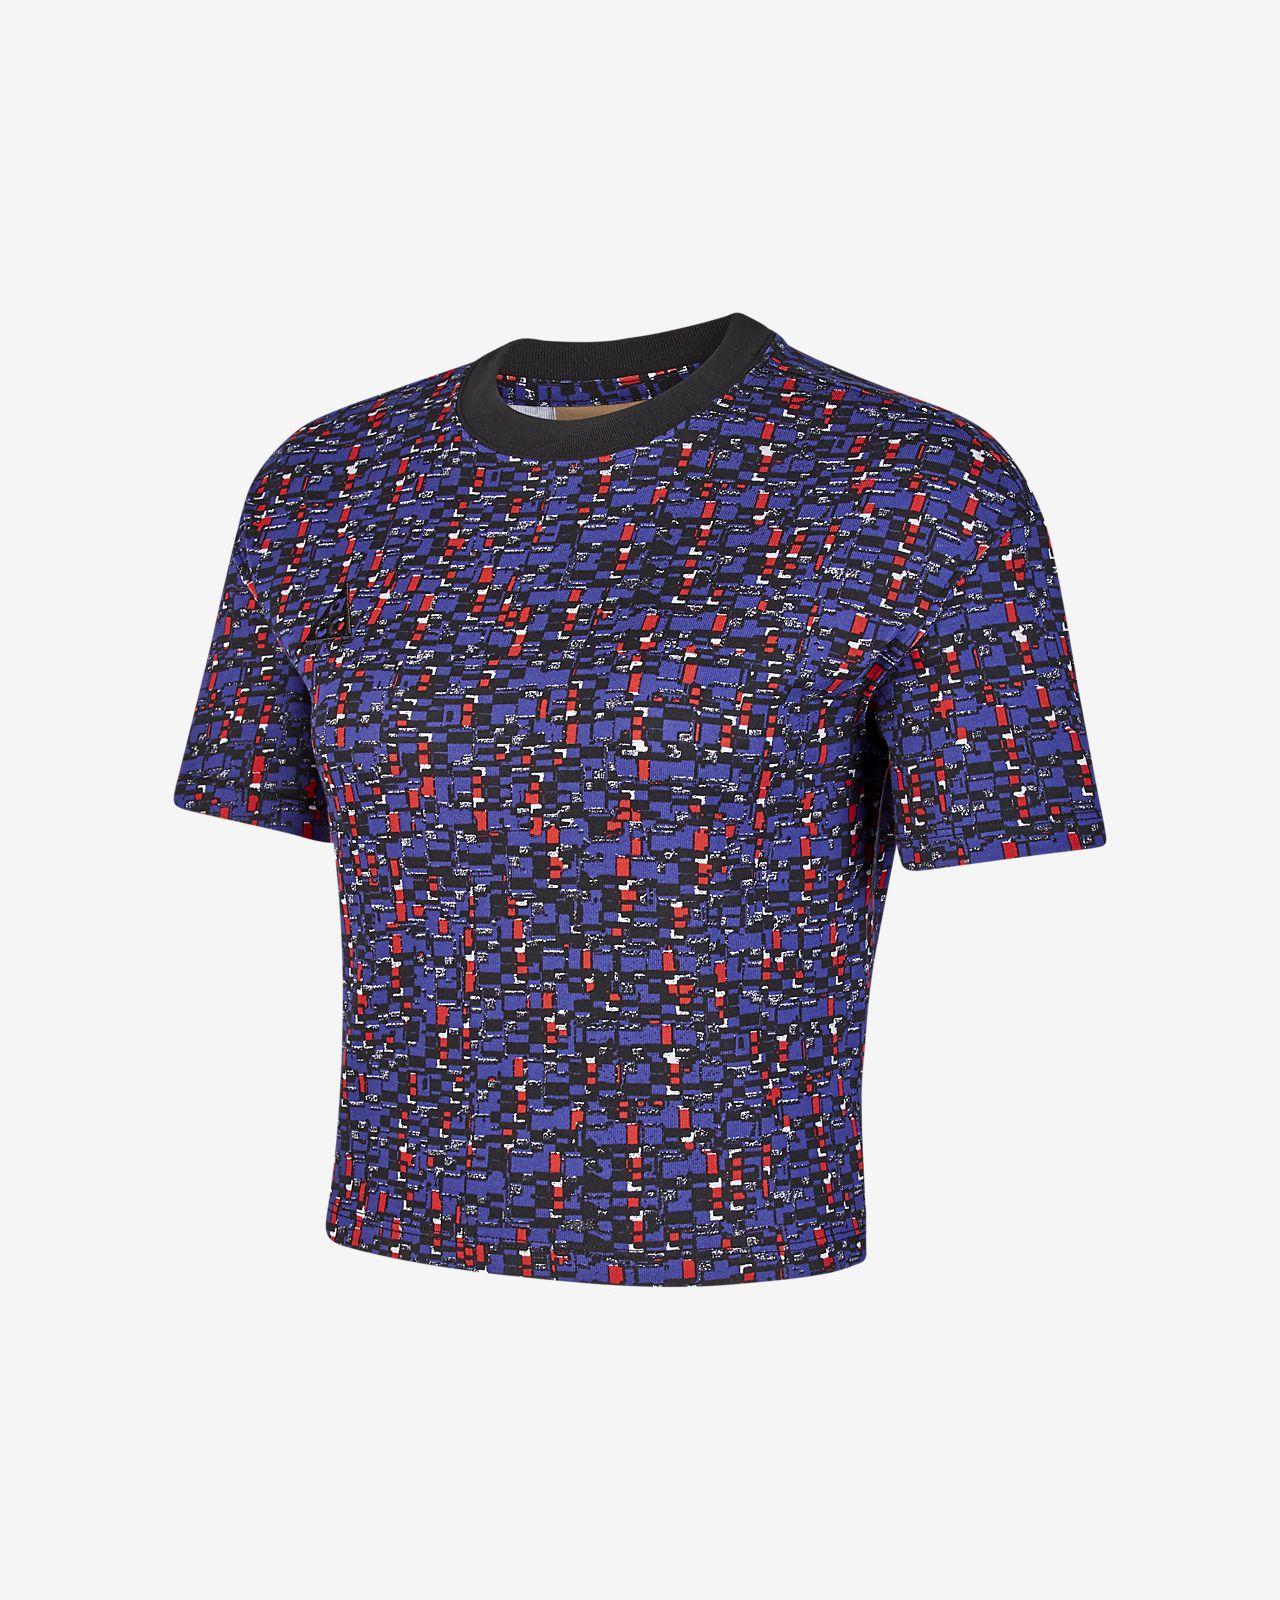 Nike ACG Women's Printed Short-Sleeve T-Shirt